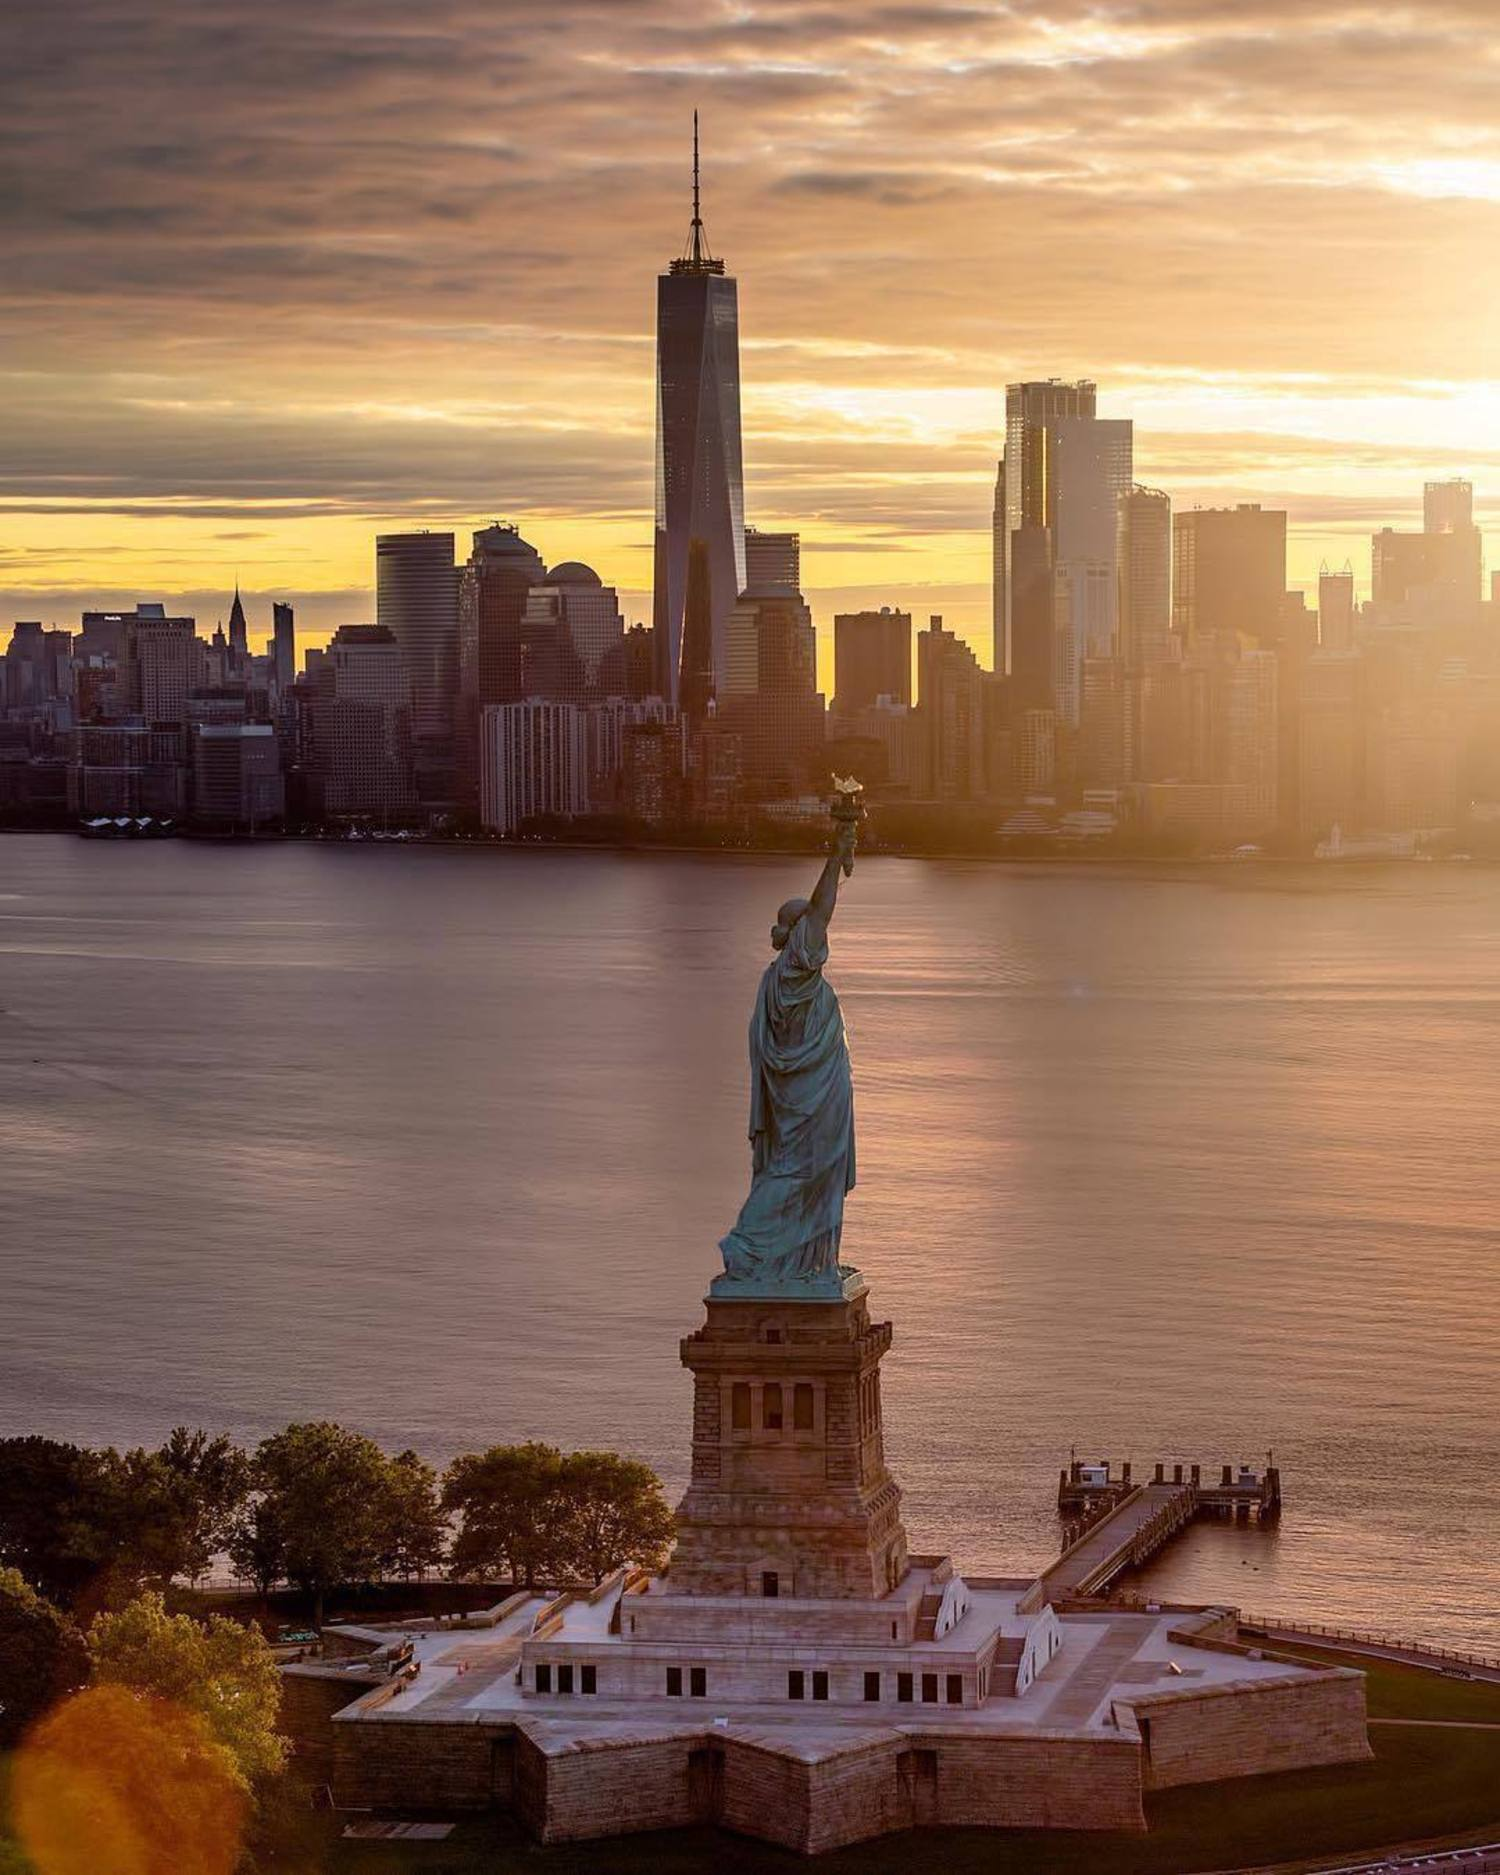 Statue of Liberty, New York, New York. Photo via @beholdingeye #viewingnyc #nyc #newyorkcity #newyork #statueofliberty #sunrises